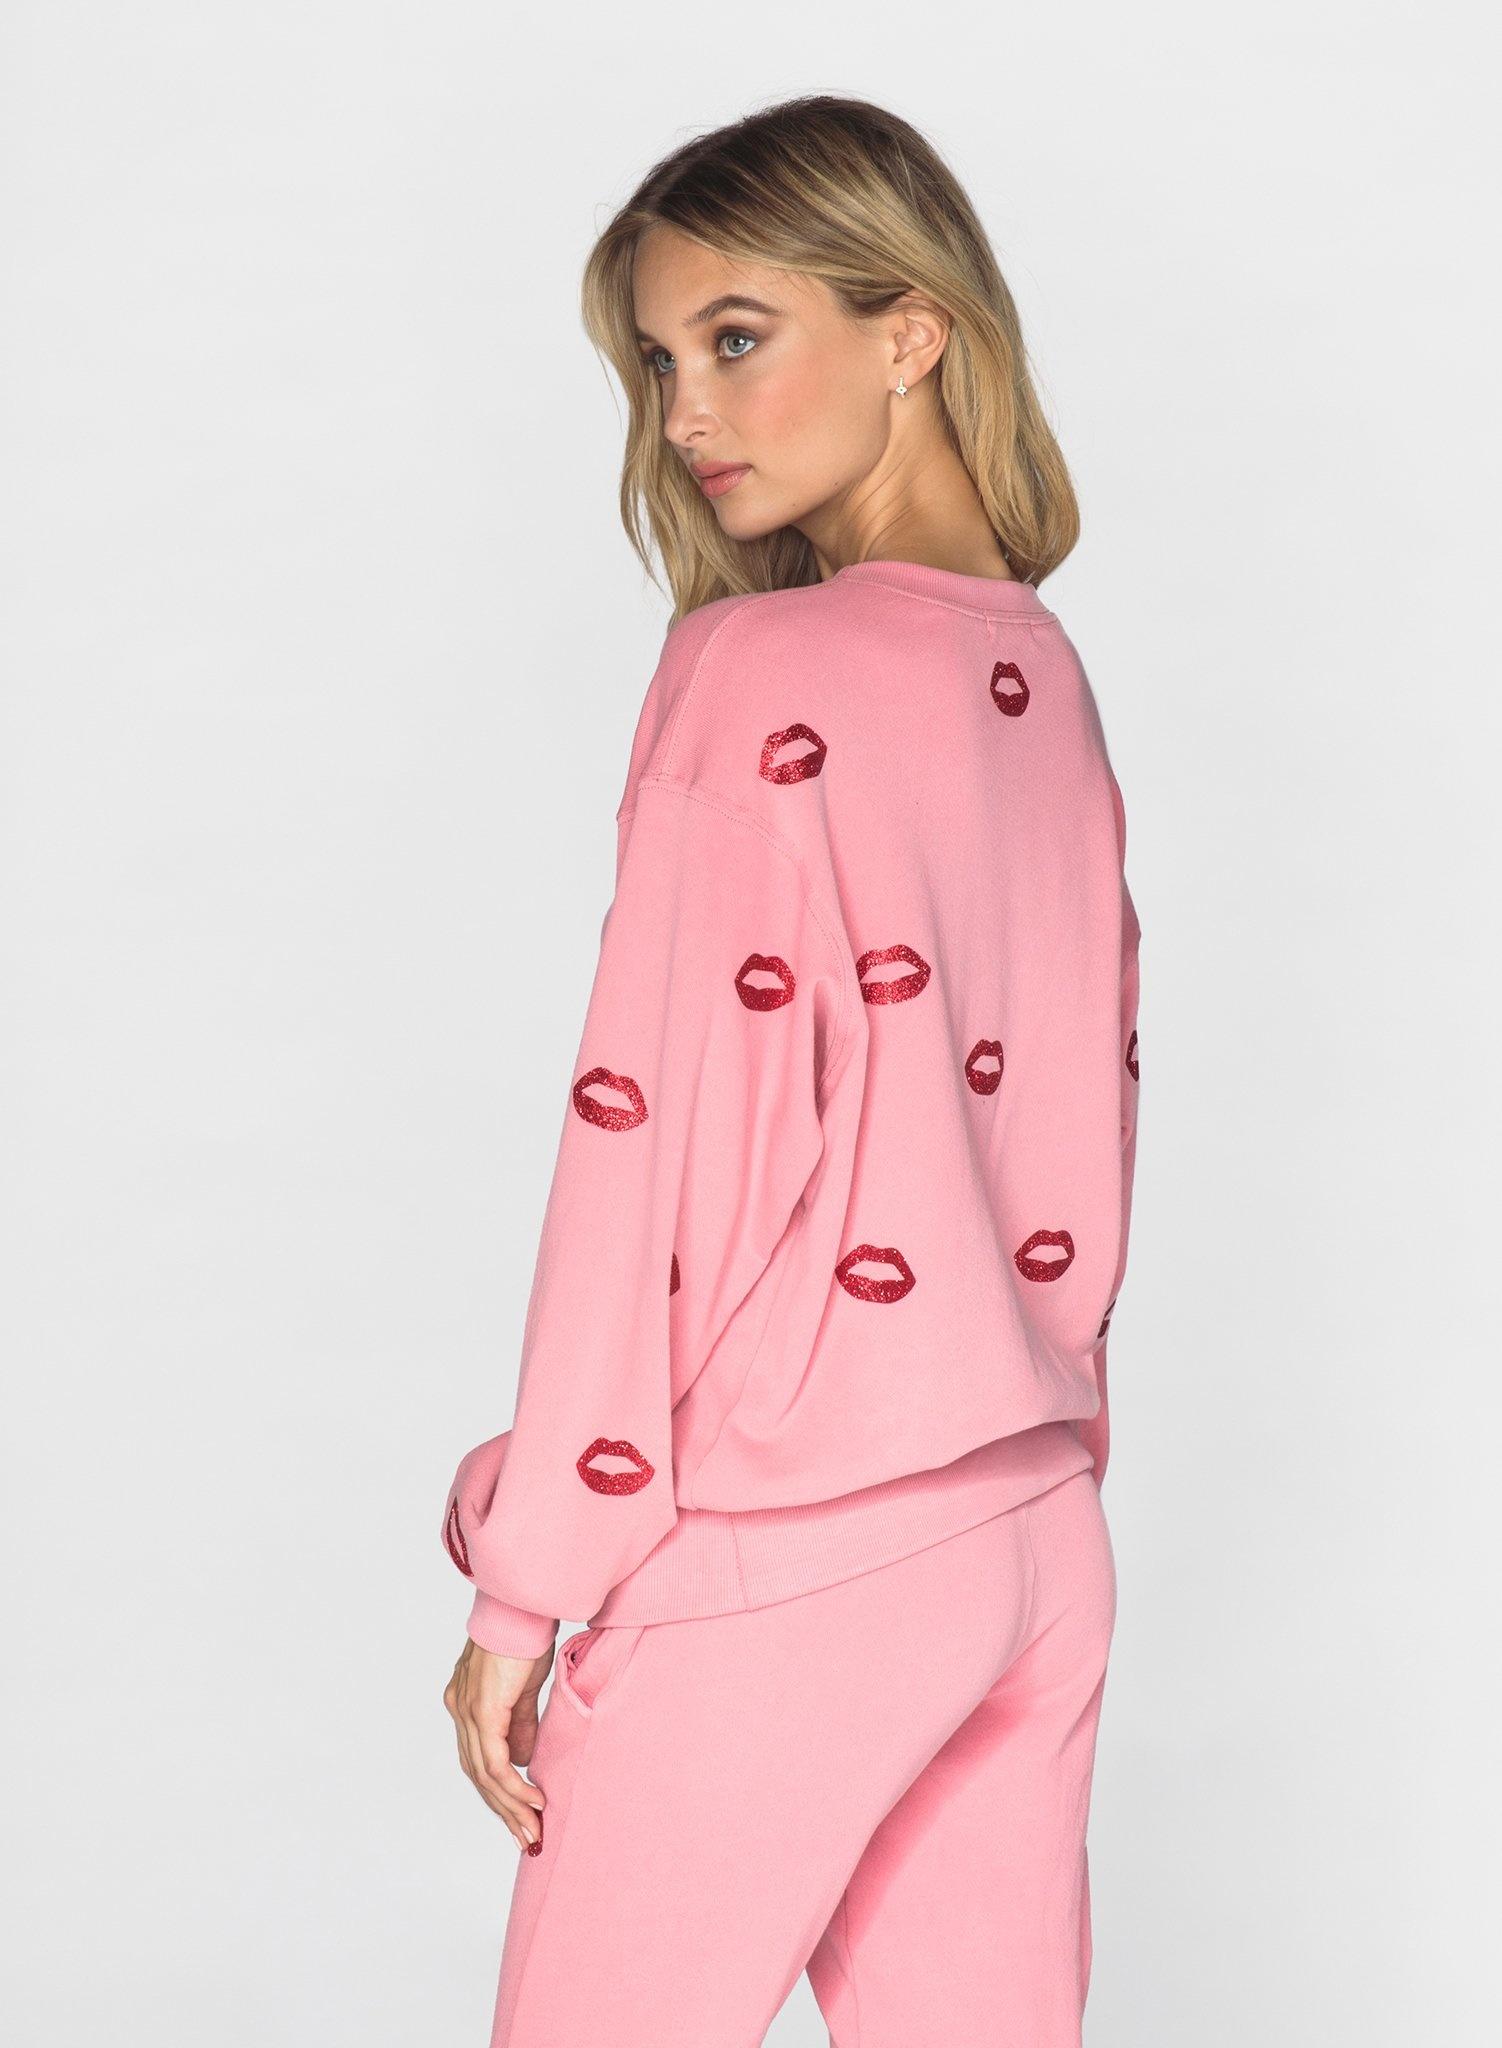 CHRLDR LÈVRES GLAMOUR -  Sweatshirt Oversized